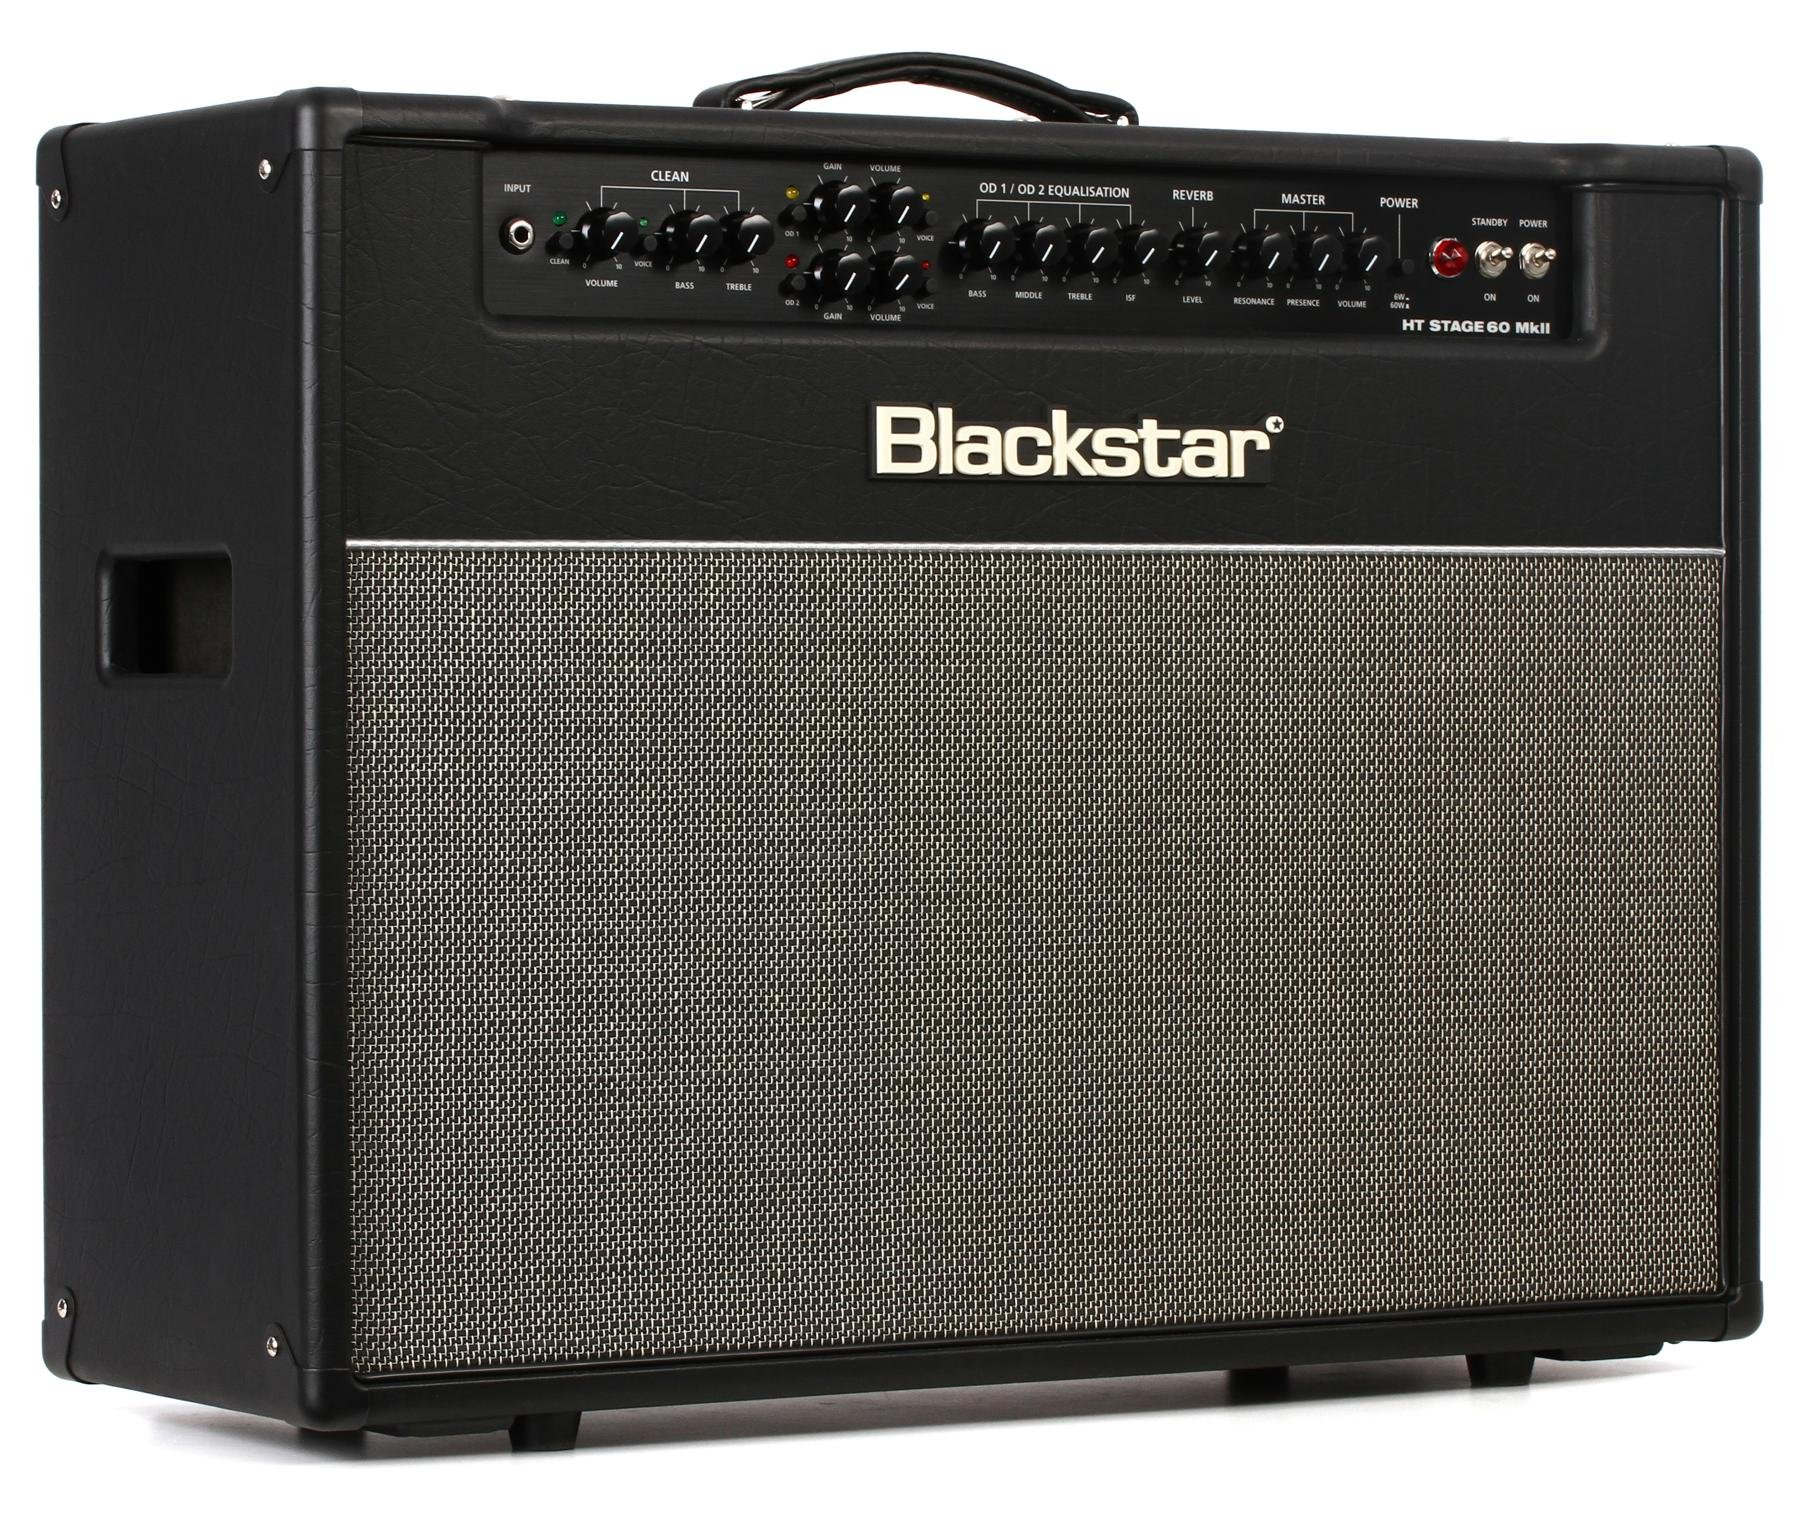 Blackstar Ht Stage 60 Mark Ii Watt 2x12 Combo Amp Sweetwater Amplifier Circuit Image 1